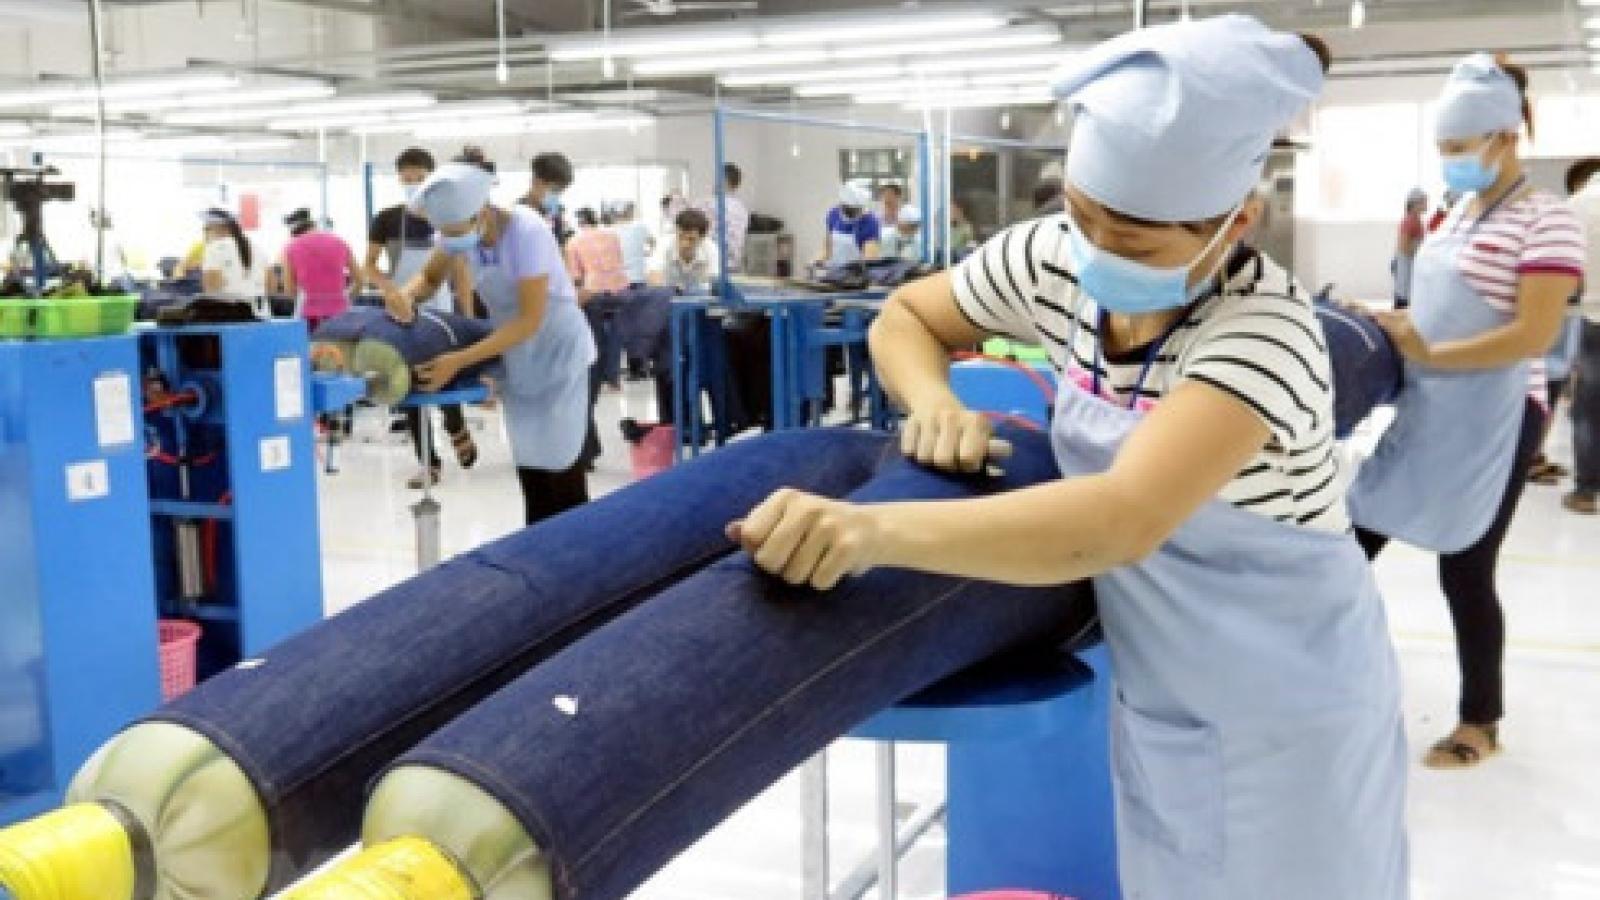 Trade surplus estimated at US$7.21 billion this year